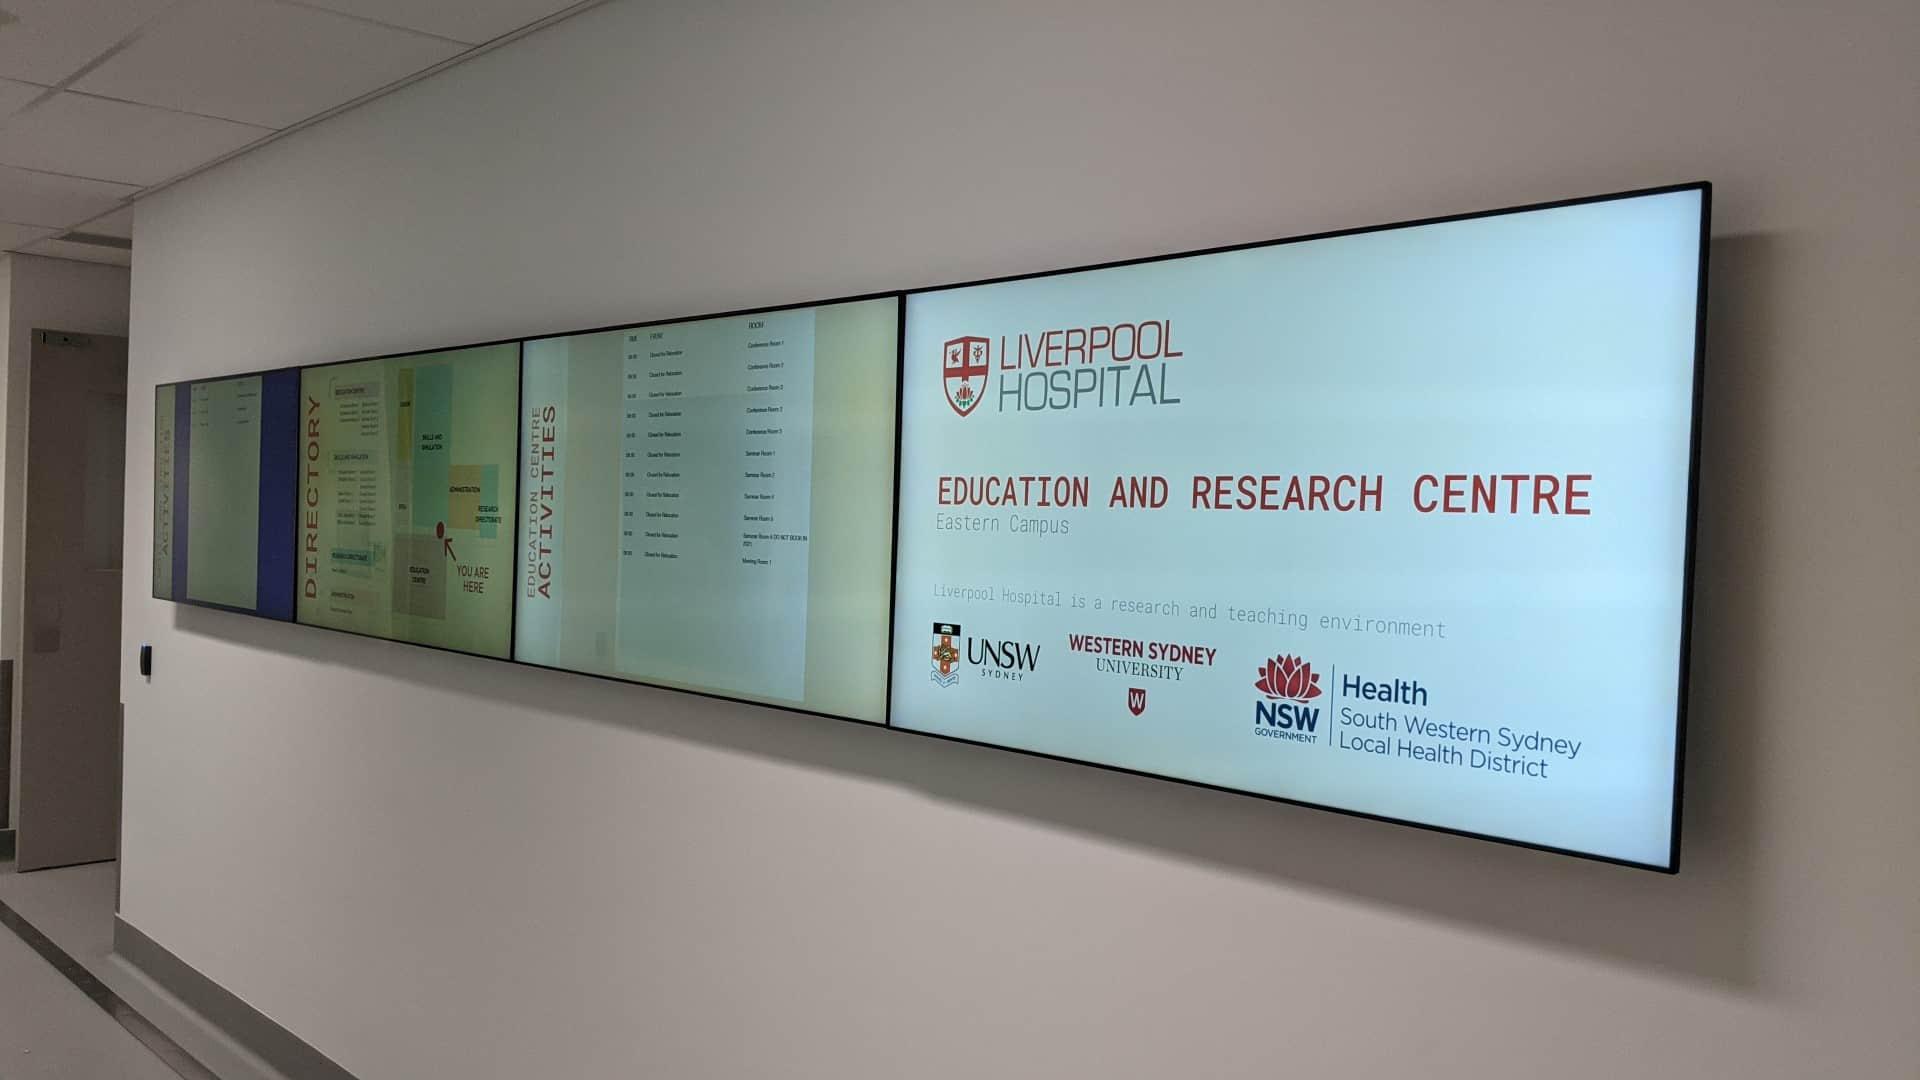 Video Wall & Digital Directory & Digital Wayfinding – UNSW Medicine & Health South West Sydney Precinct 4×1 Video Wall